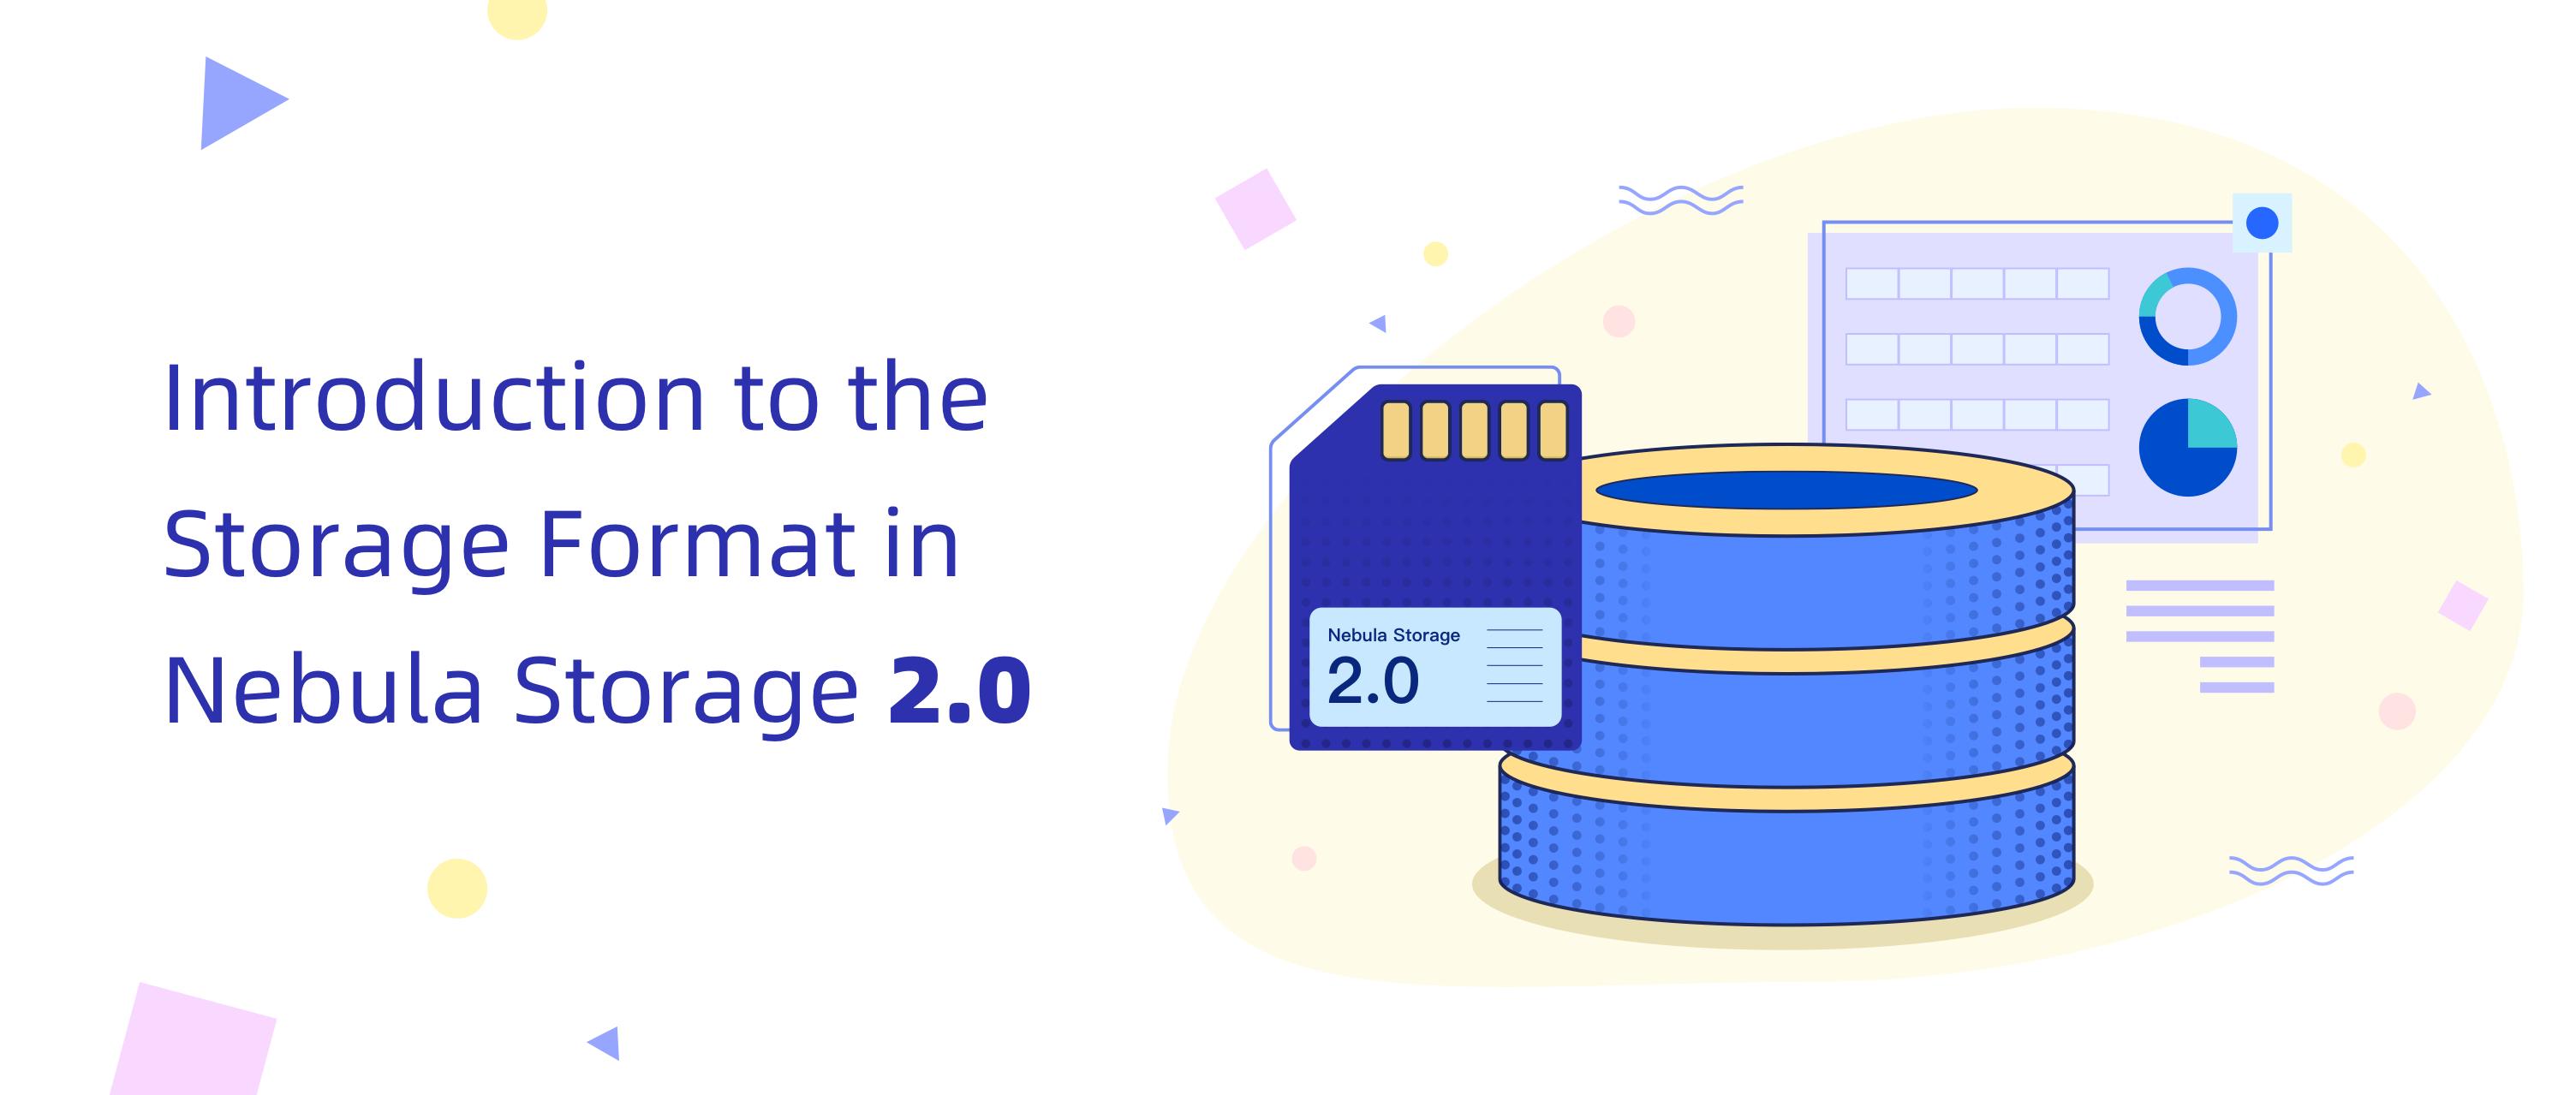 storage-format-in-nebula-graph-2.0